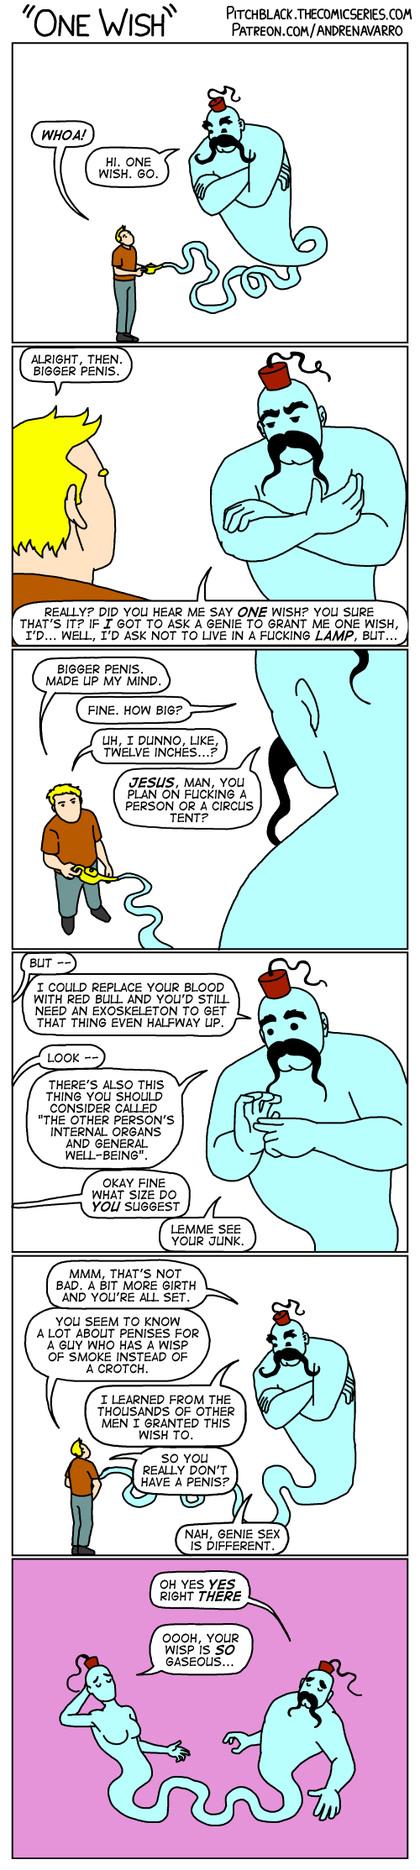 genie sex must be amazing - meme